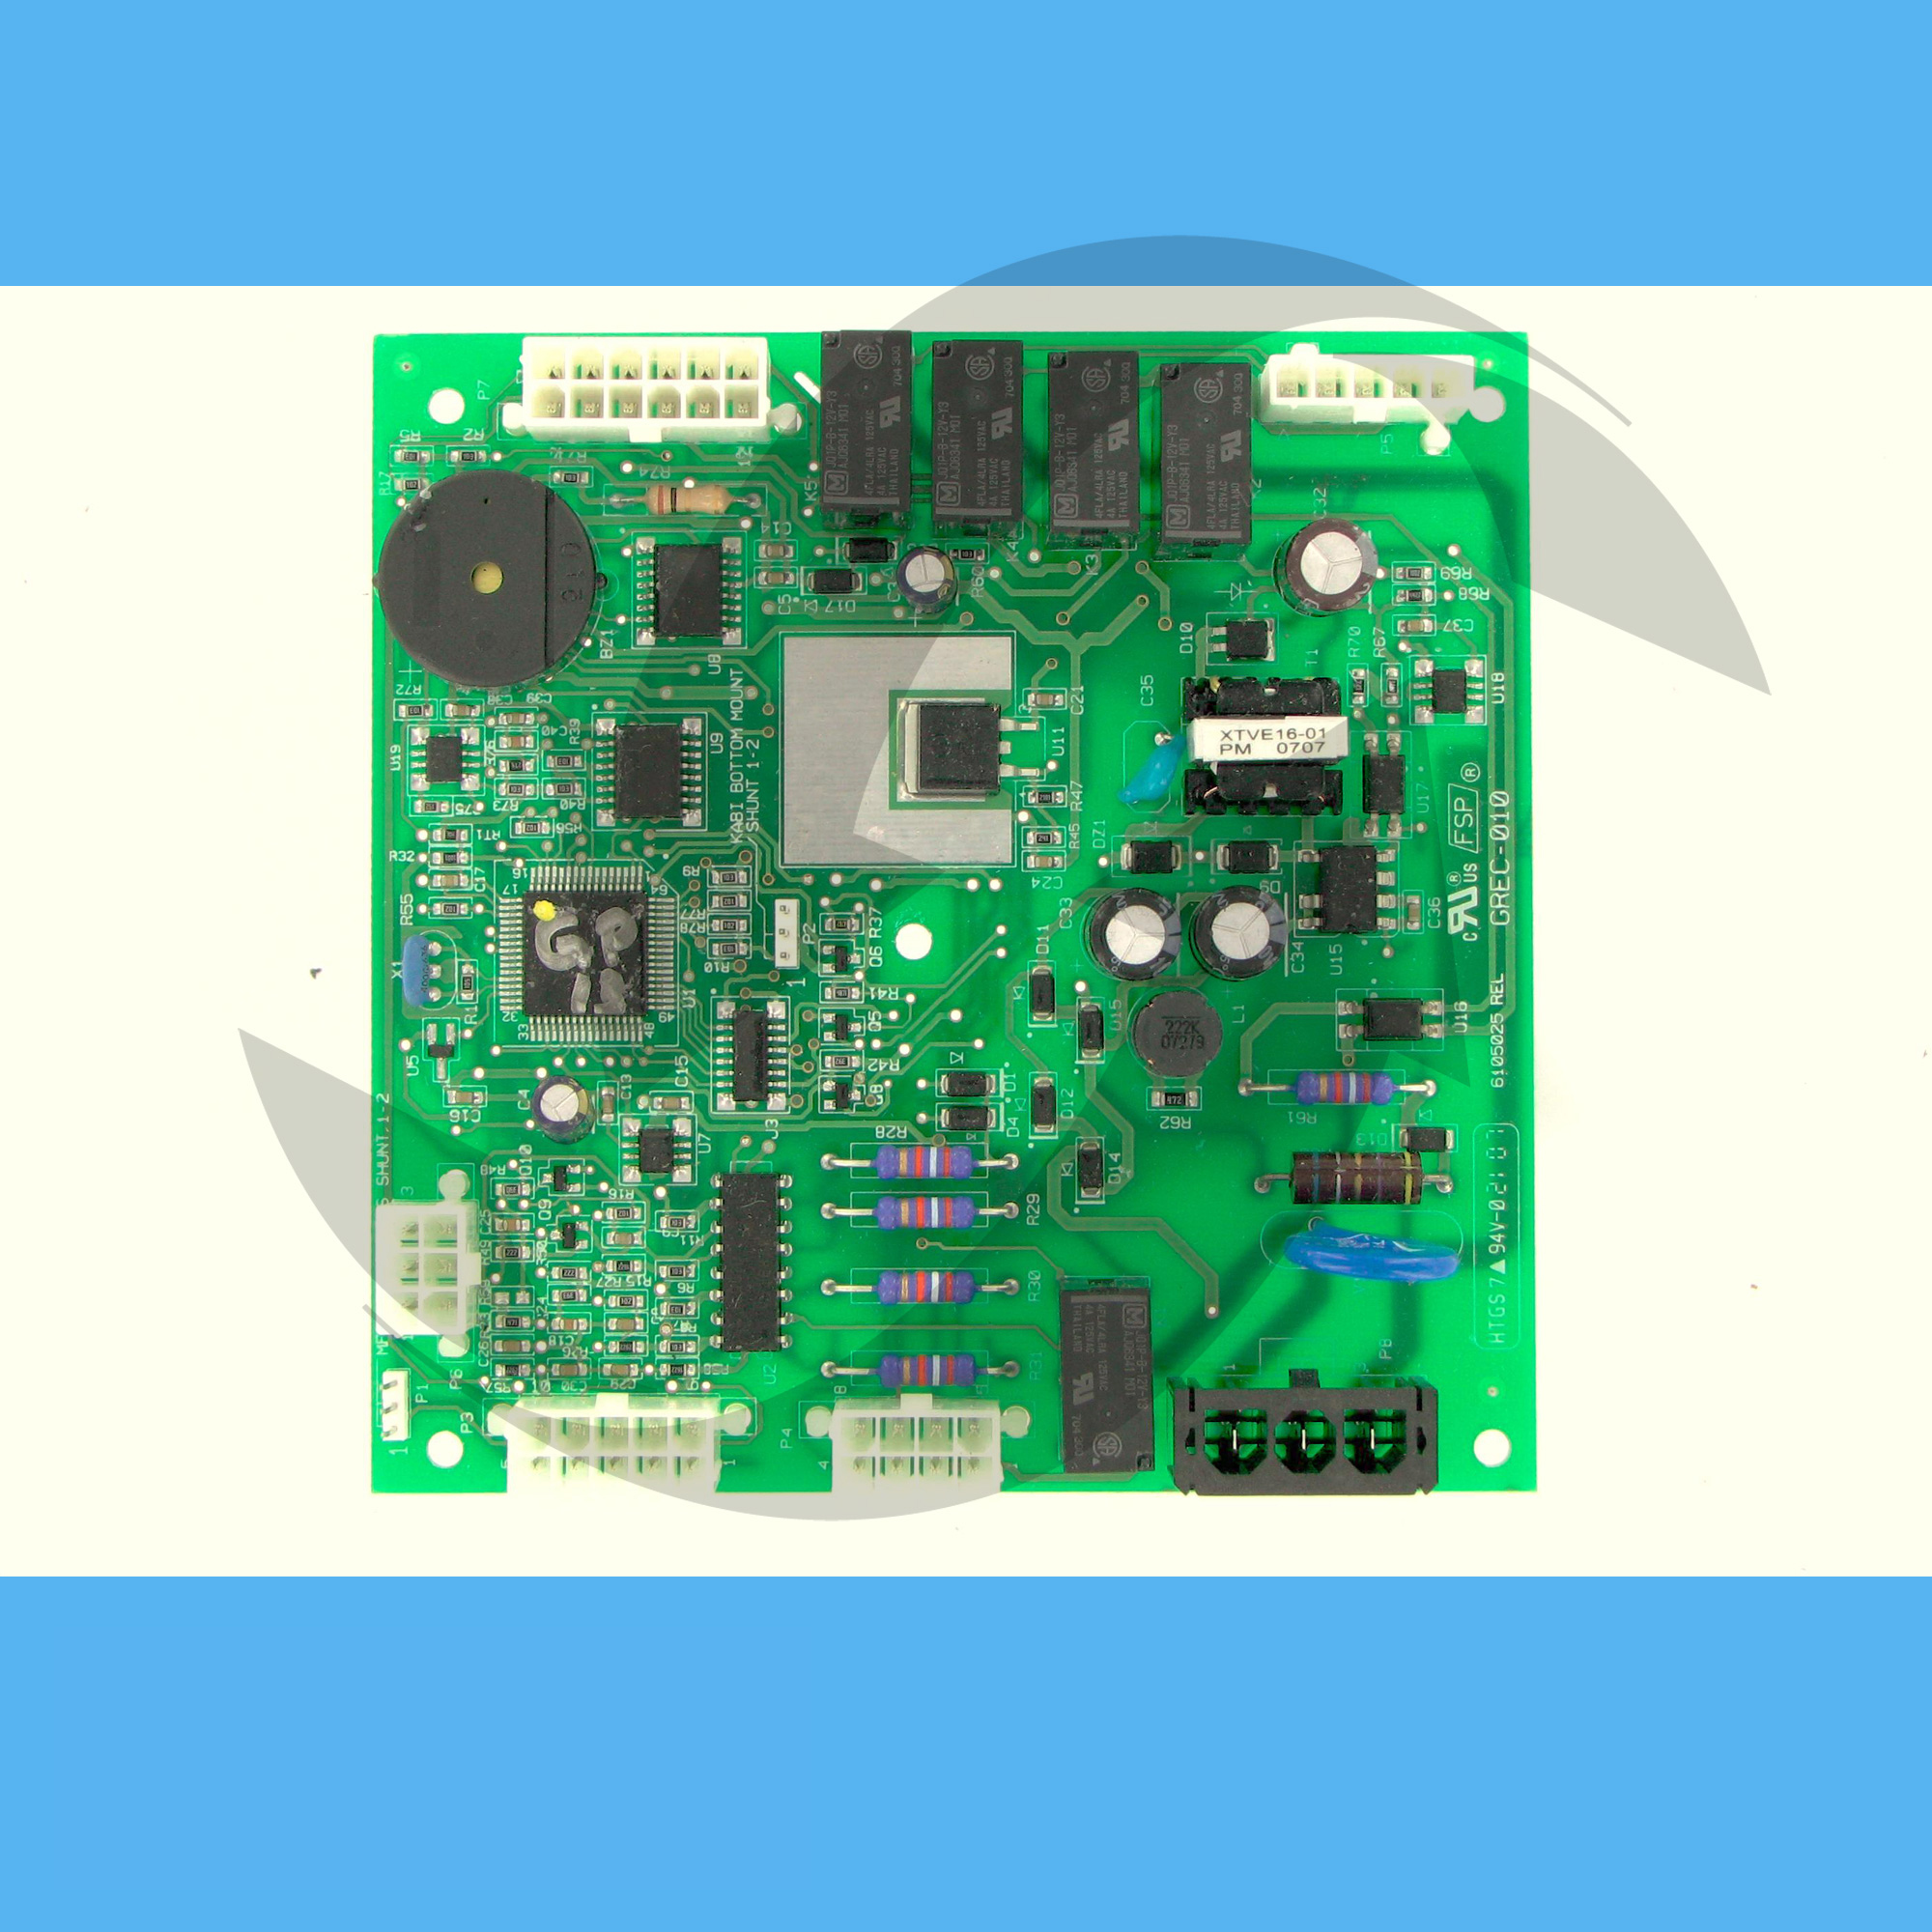 Whirlpool-Refrigerator-Control-W10219463